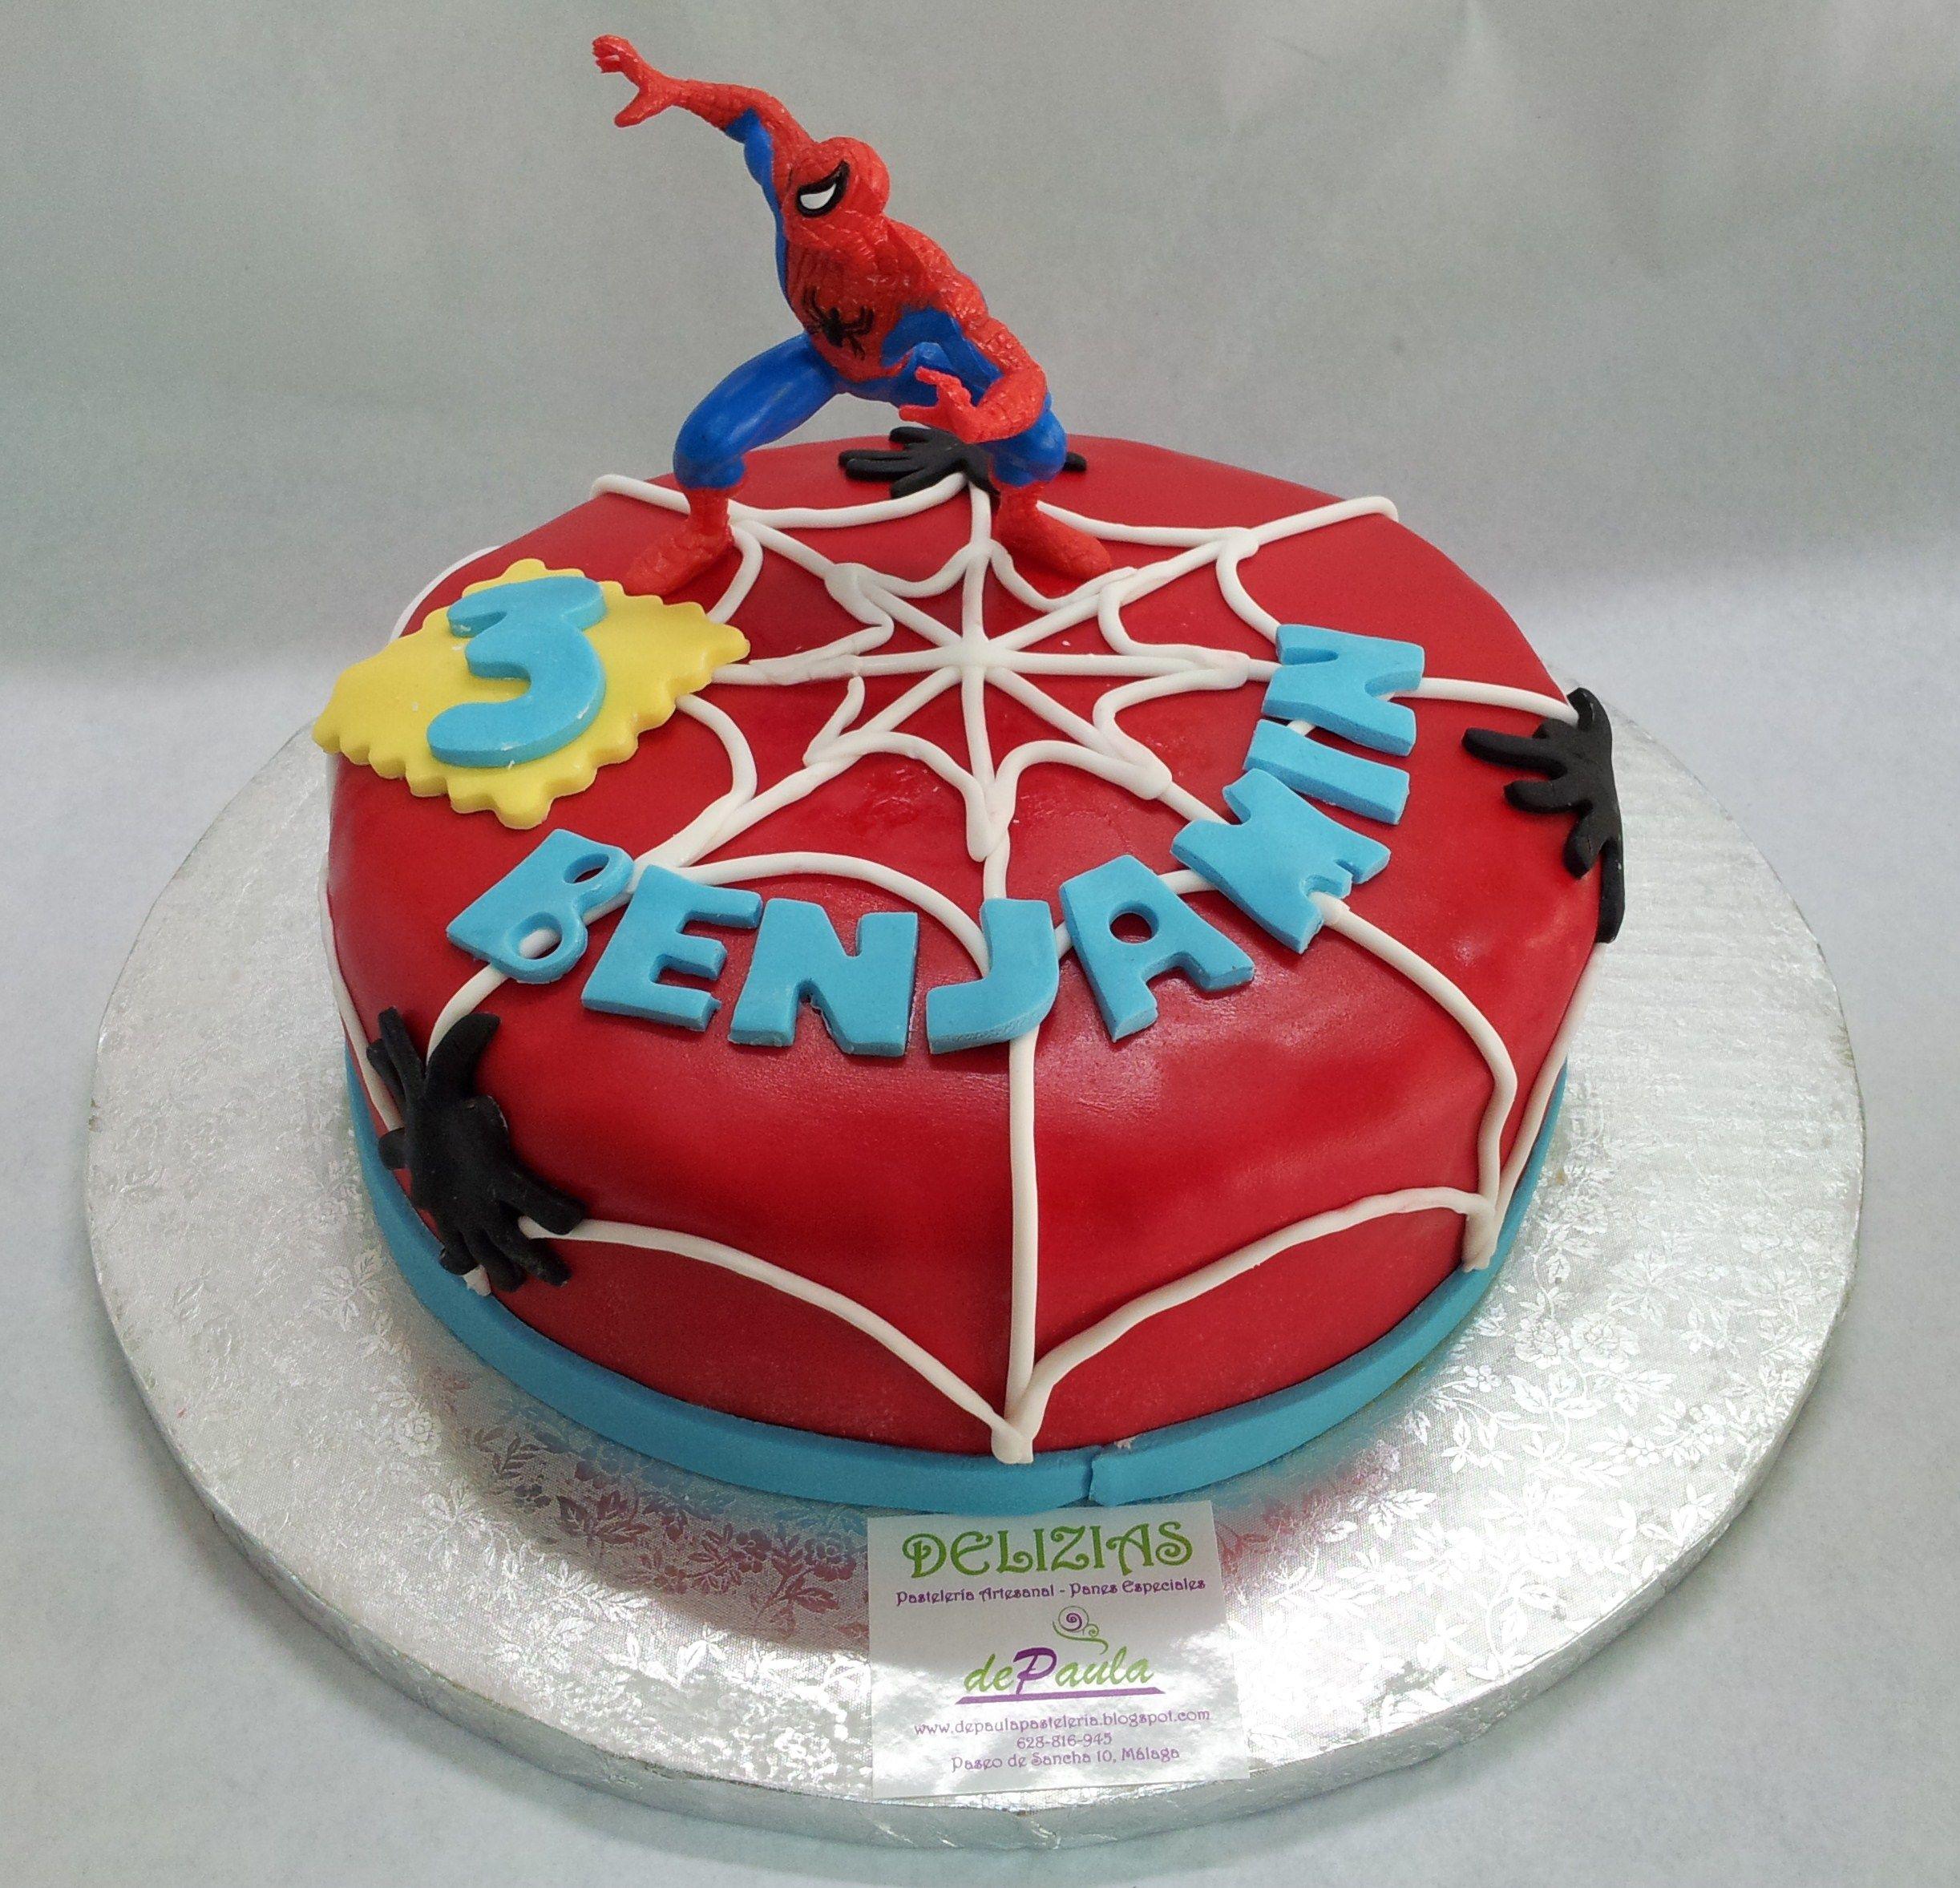 Tarta personalizada con Fondant Spiderman Quien fuera nio